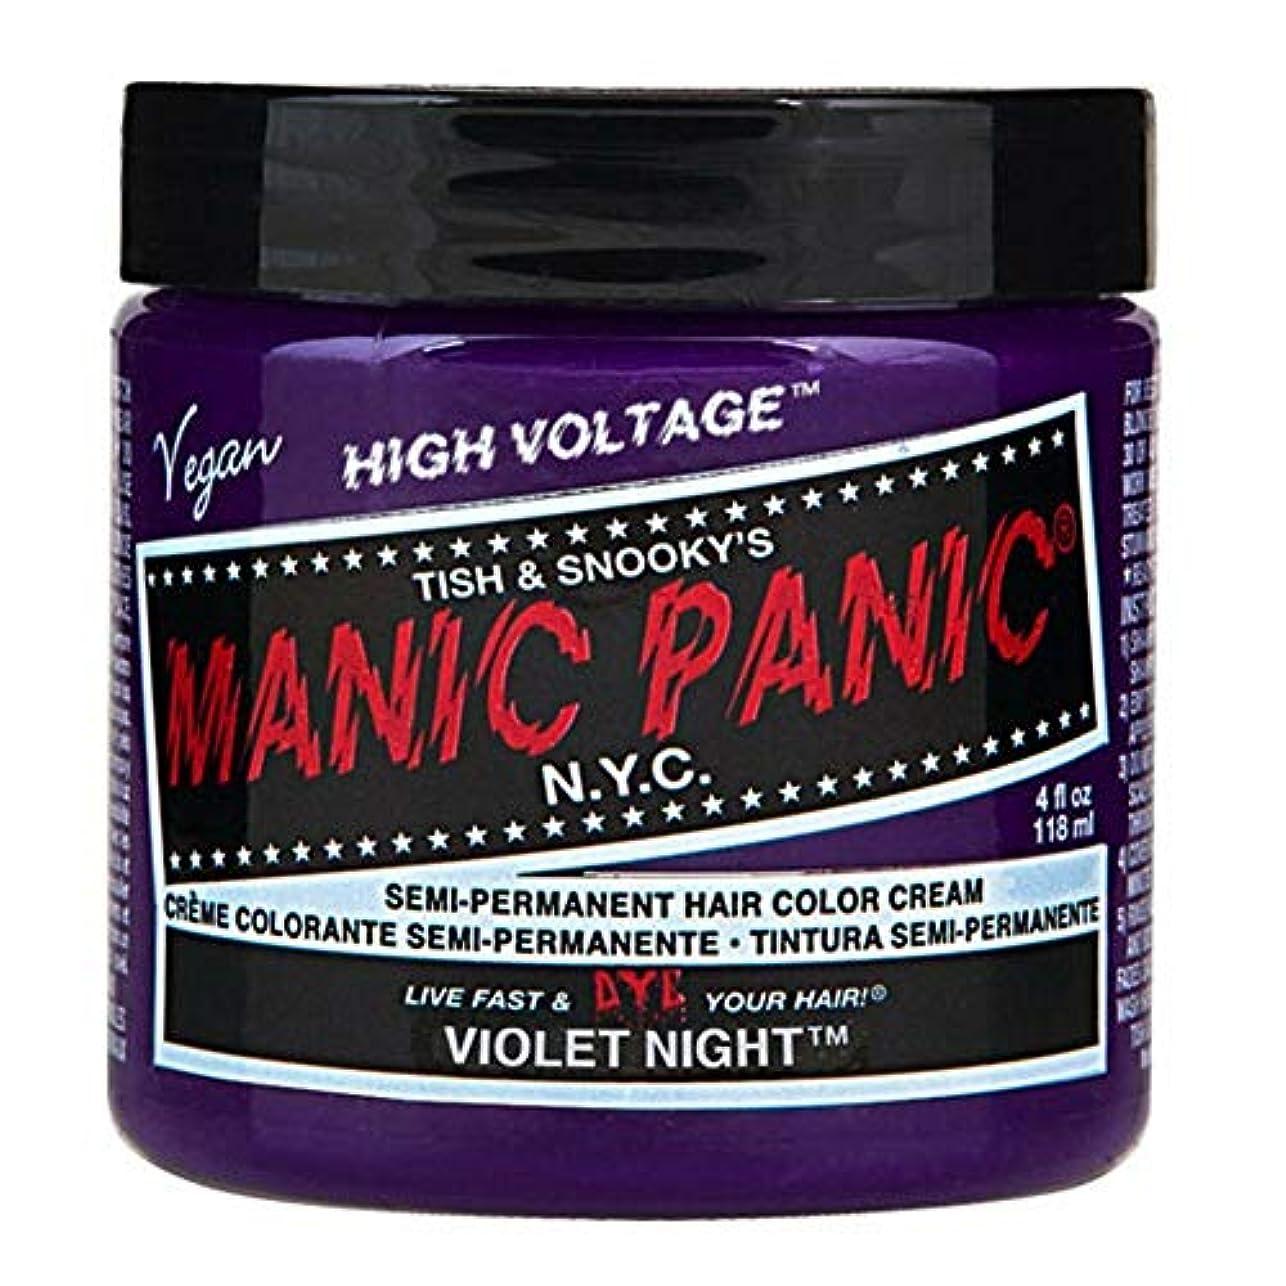 変更逃すManic Panic High Voltage Hair Dye - Vegan Hair Dye - Violet Night (dark purple) 118ml